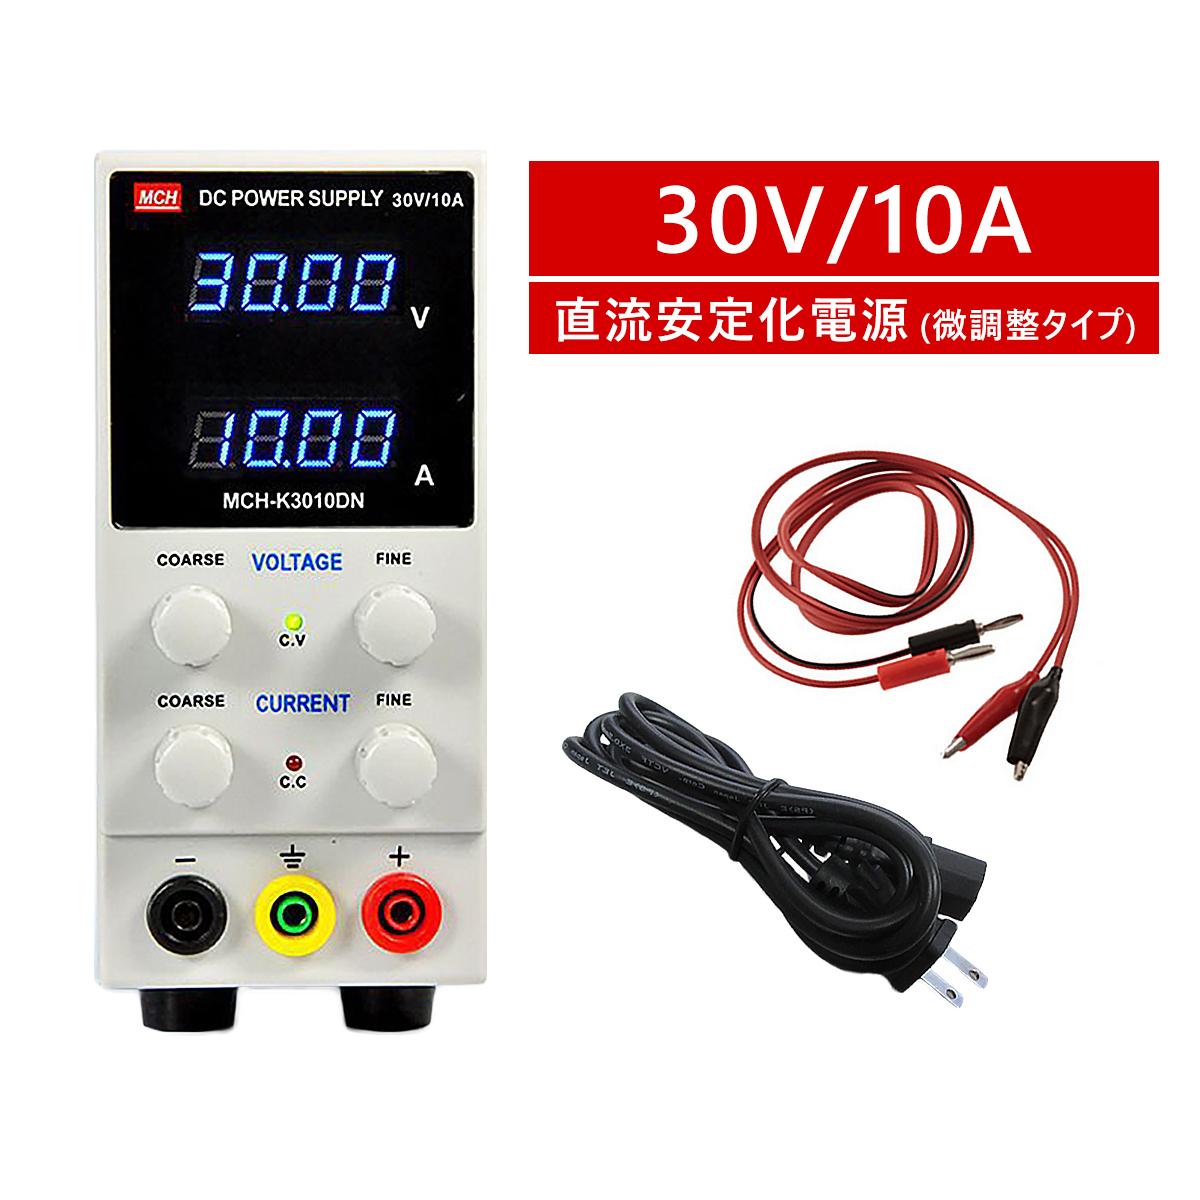 SDL 直流安定化電源 30V 10A 直流電源 10mV 1mA 微調整対応モデル スイッチング式 自動温度制御冷却ファン 直流電源装置 0-30V 0-10A 宅配便送料無料 PSE 6ヶ月保証 K&M